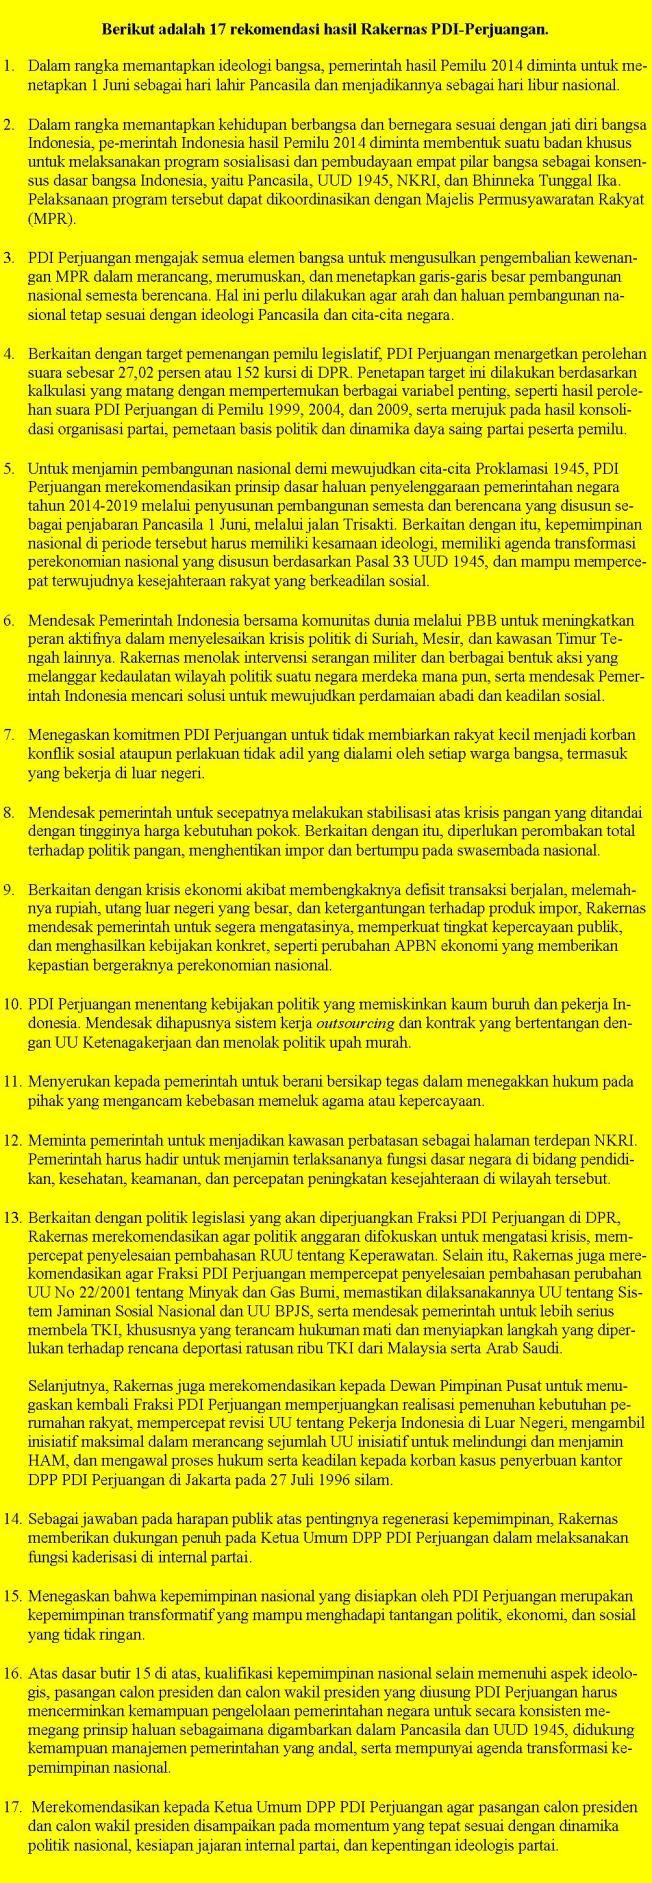 17 Poin Rakernas PDI-P 2013, sumber